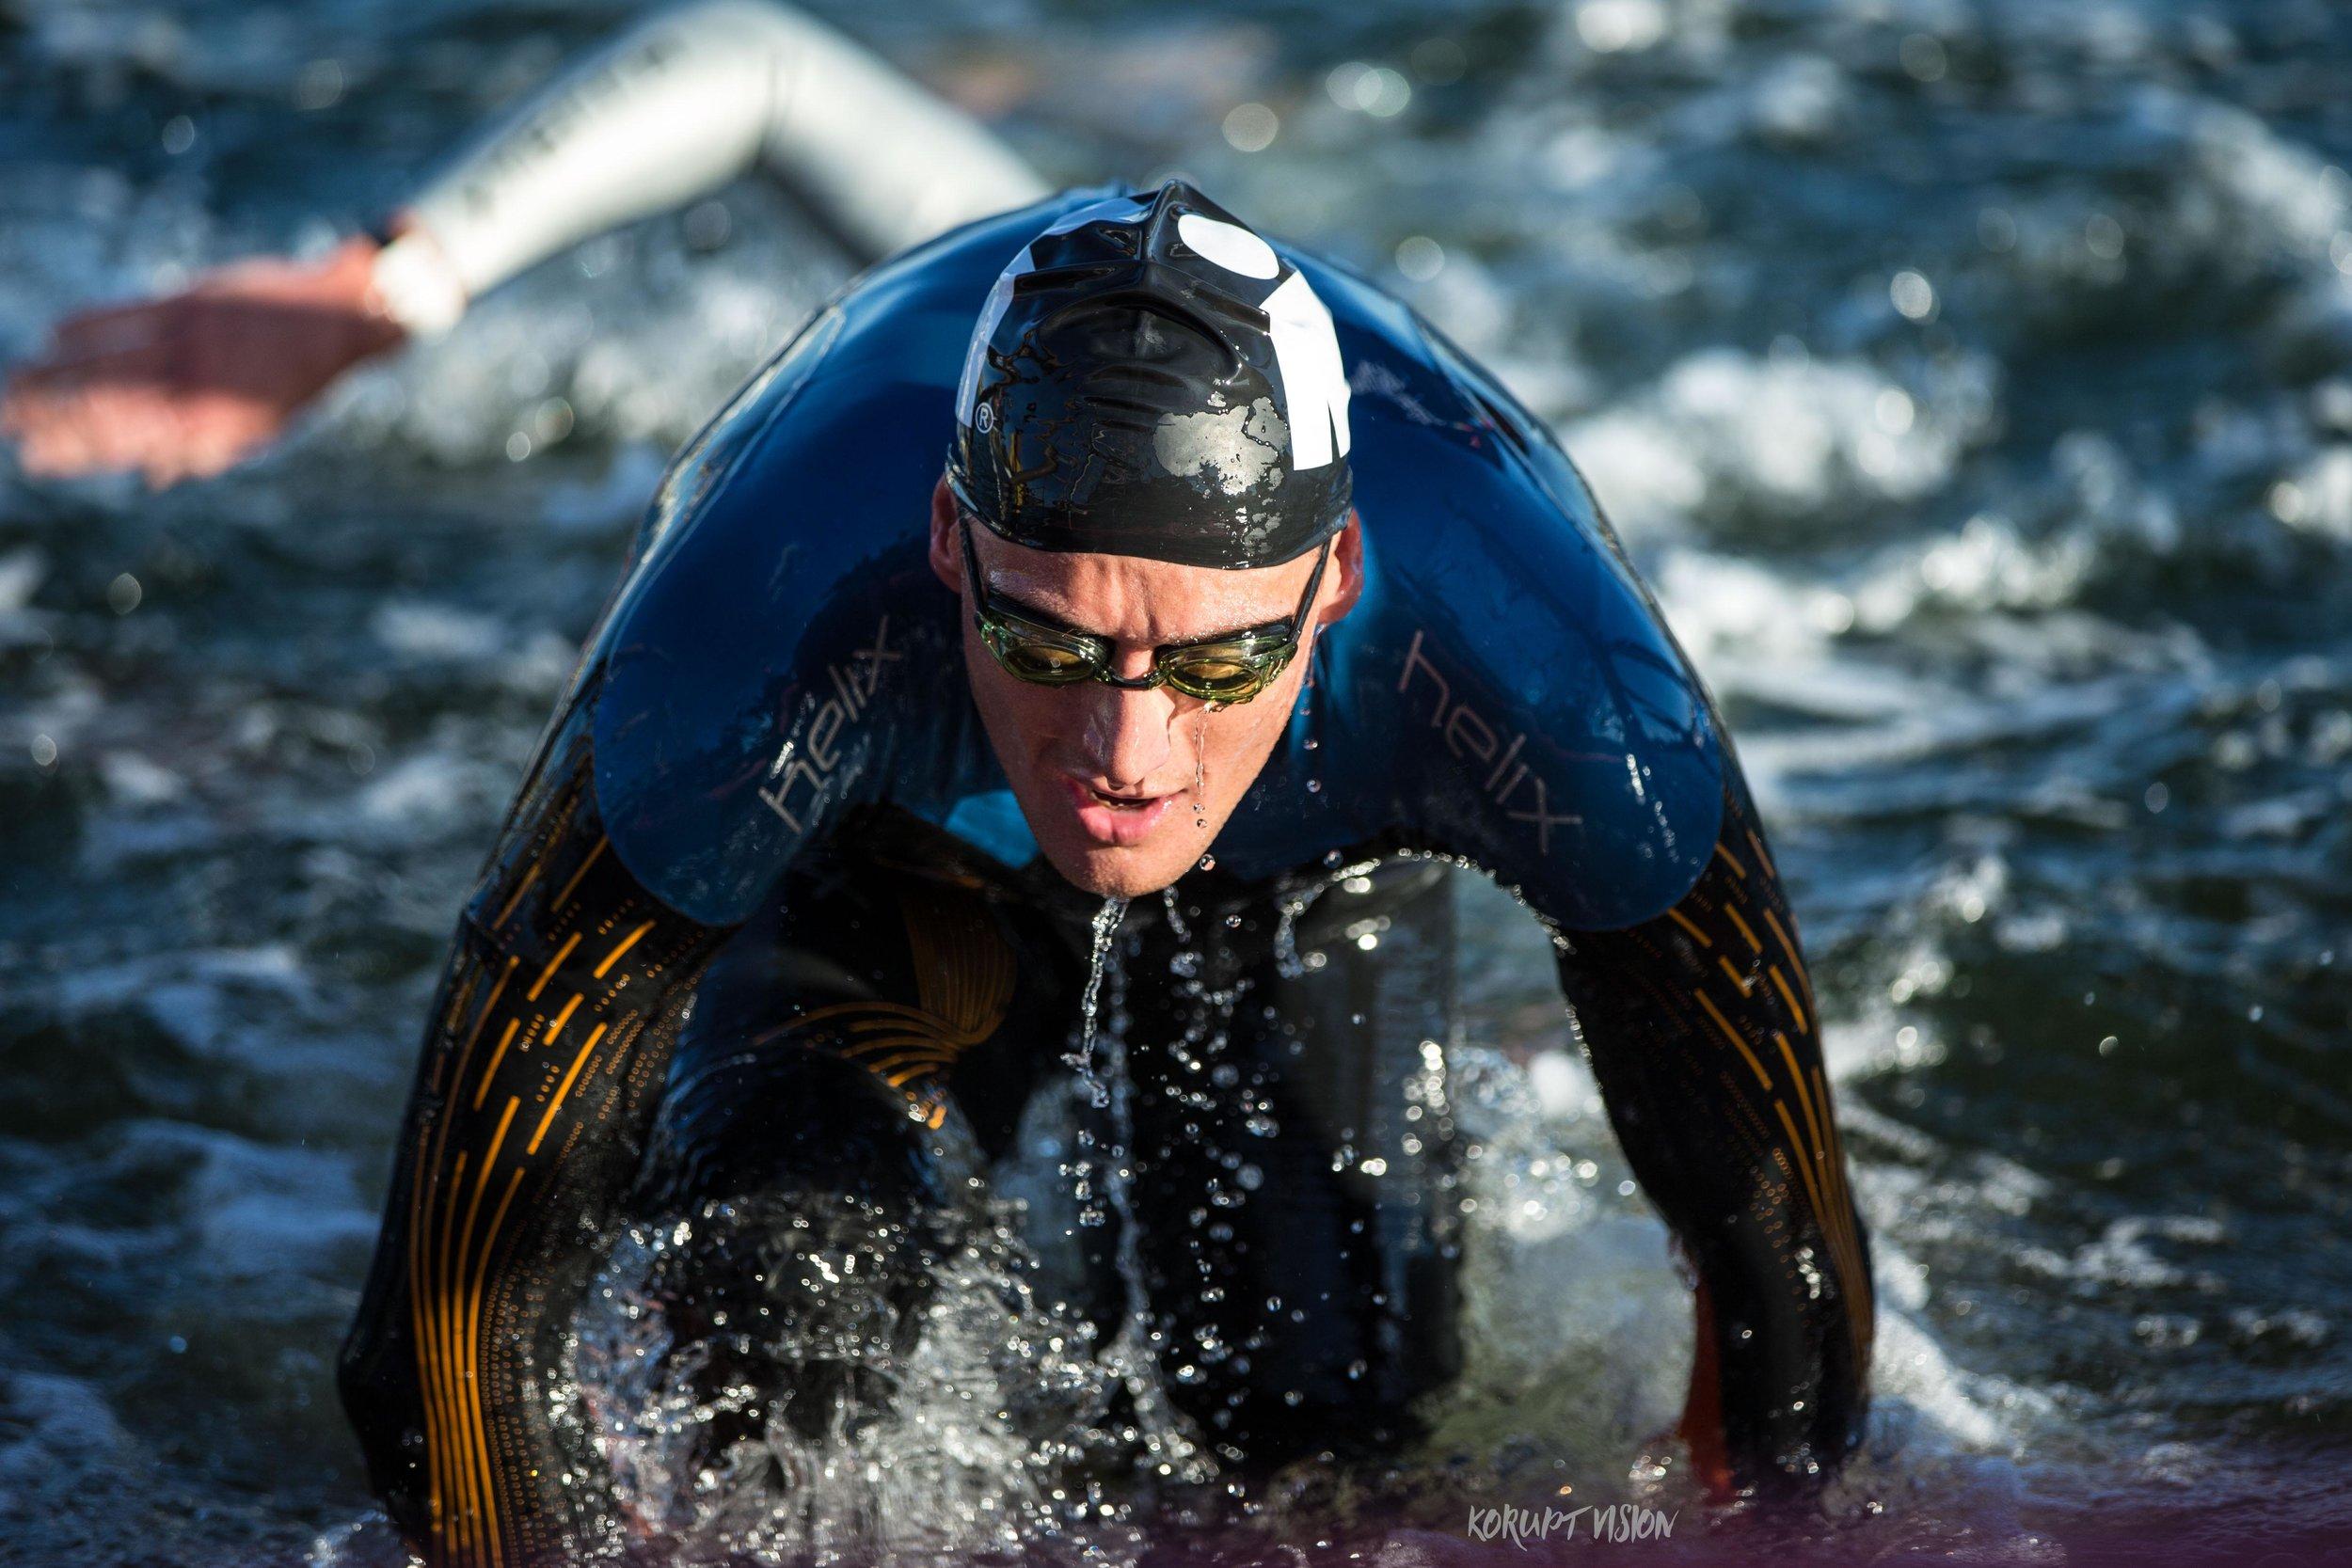 Clayton Fettell leads the swim at Ironman Australia